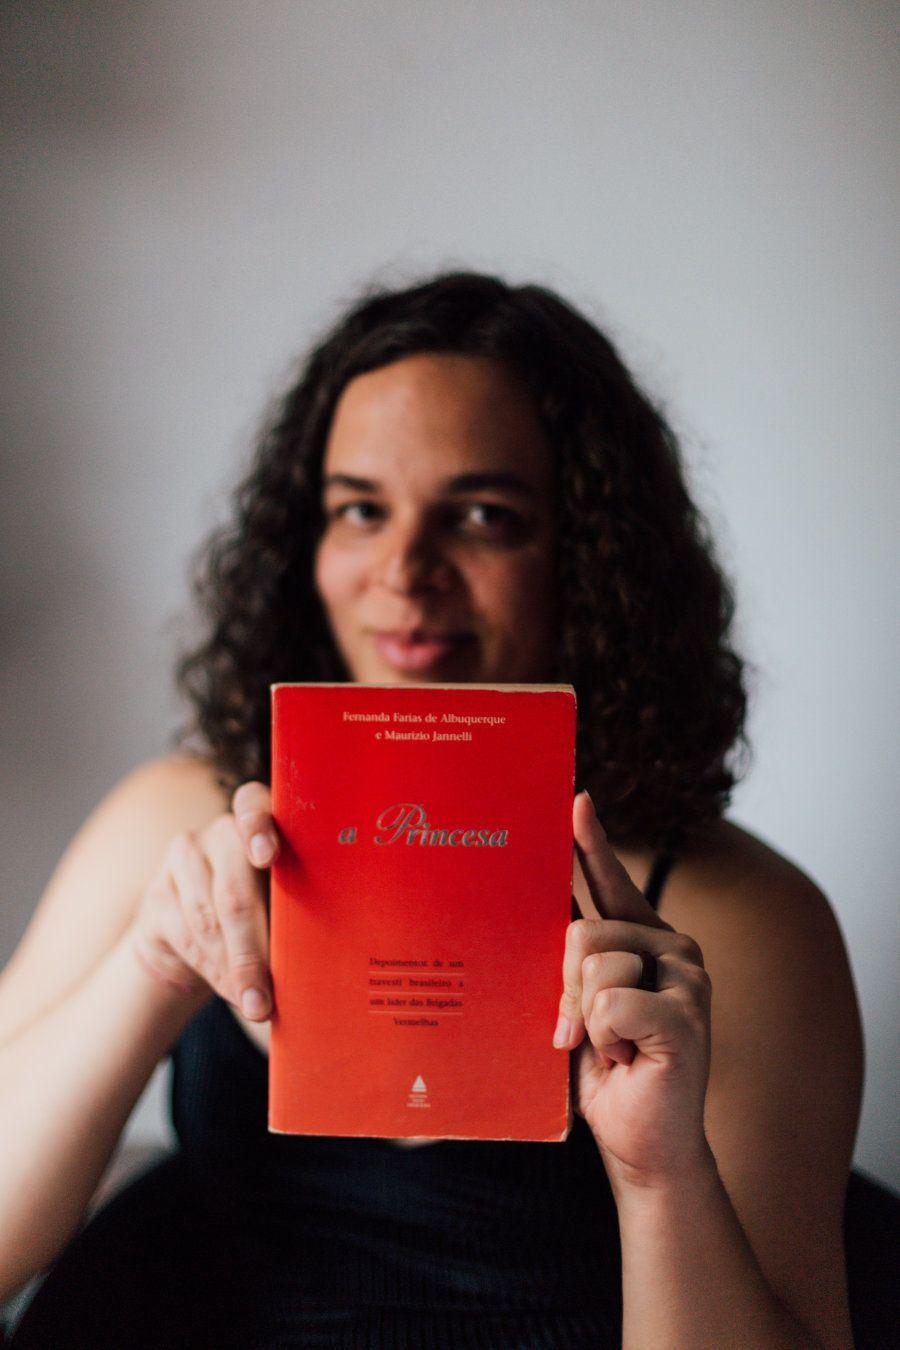 Amara Moira mostra exemplar do livro